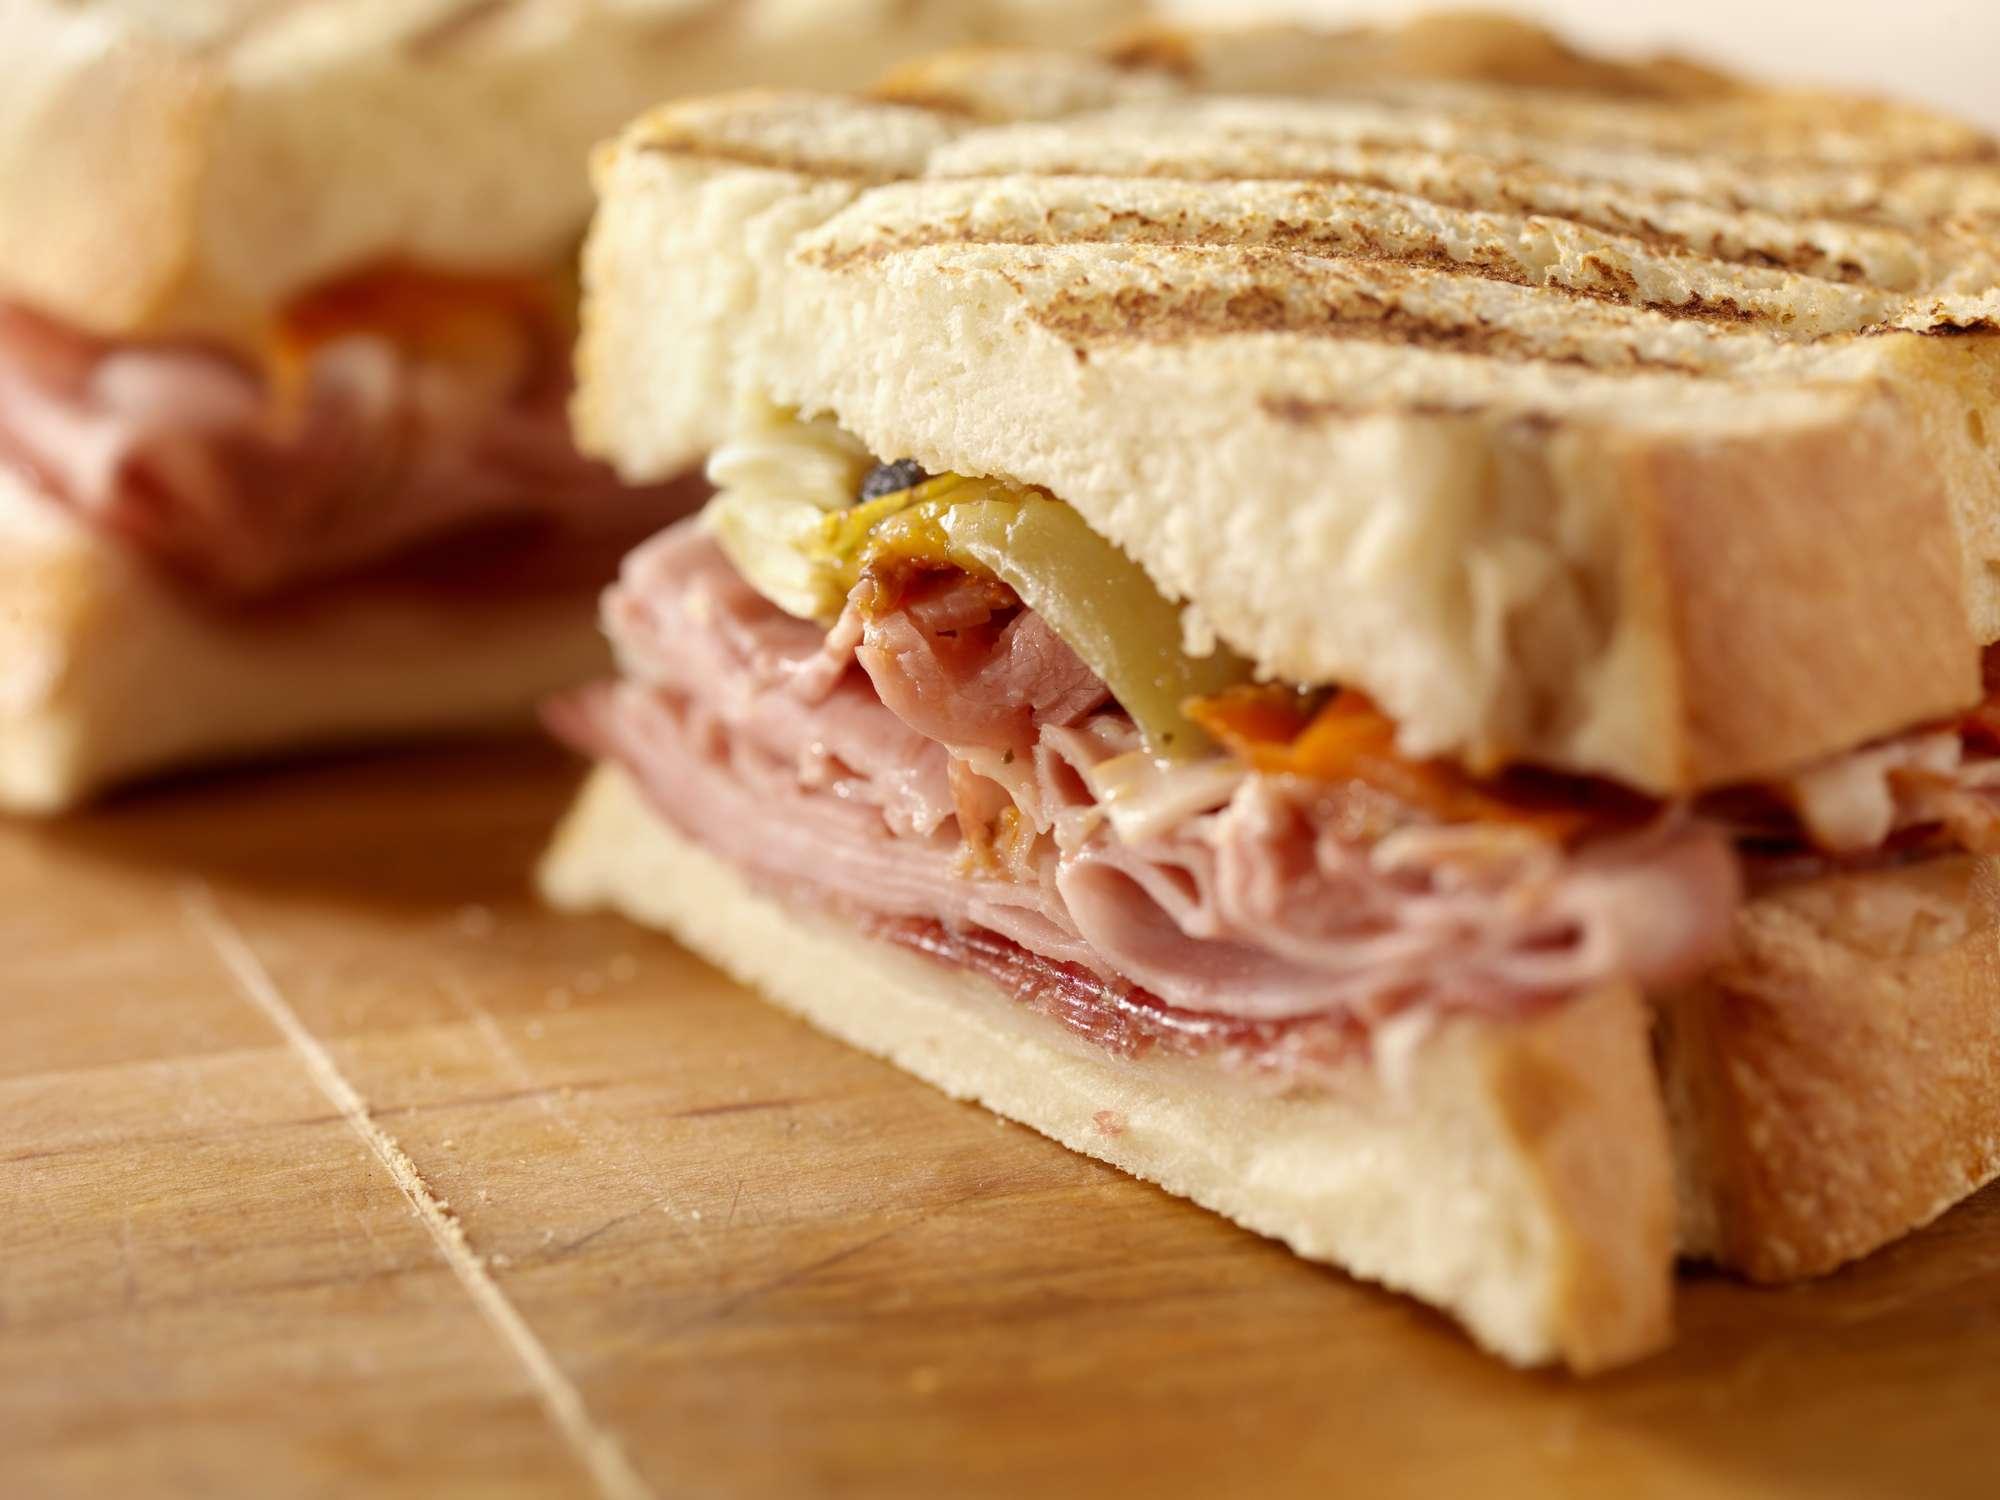 A close-up of a bologna sandwich.